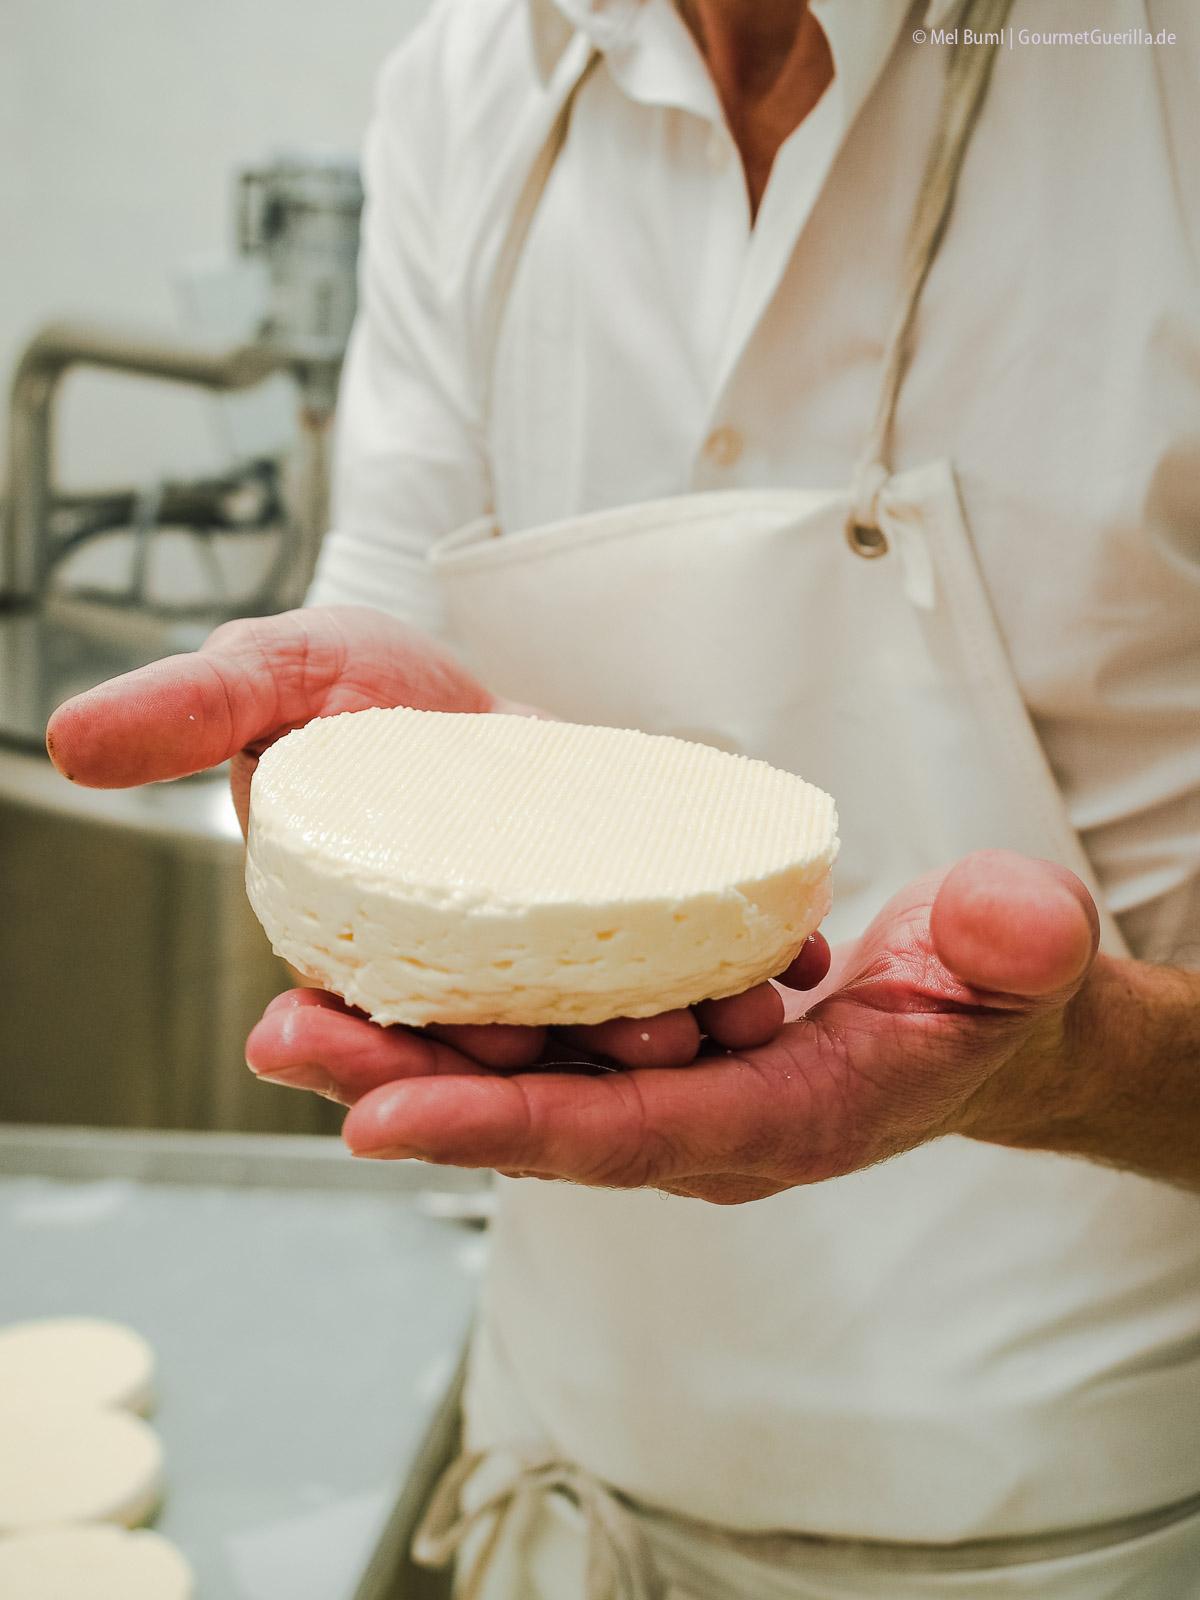 Camembert-Rohling für Heumilchkäse in Wiens einziger Stadtkäserei Lingenhel |GourmetGuerilla.de